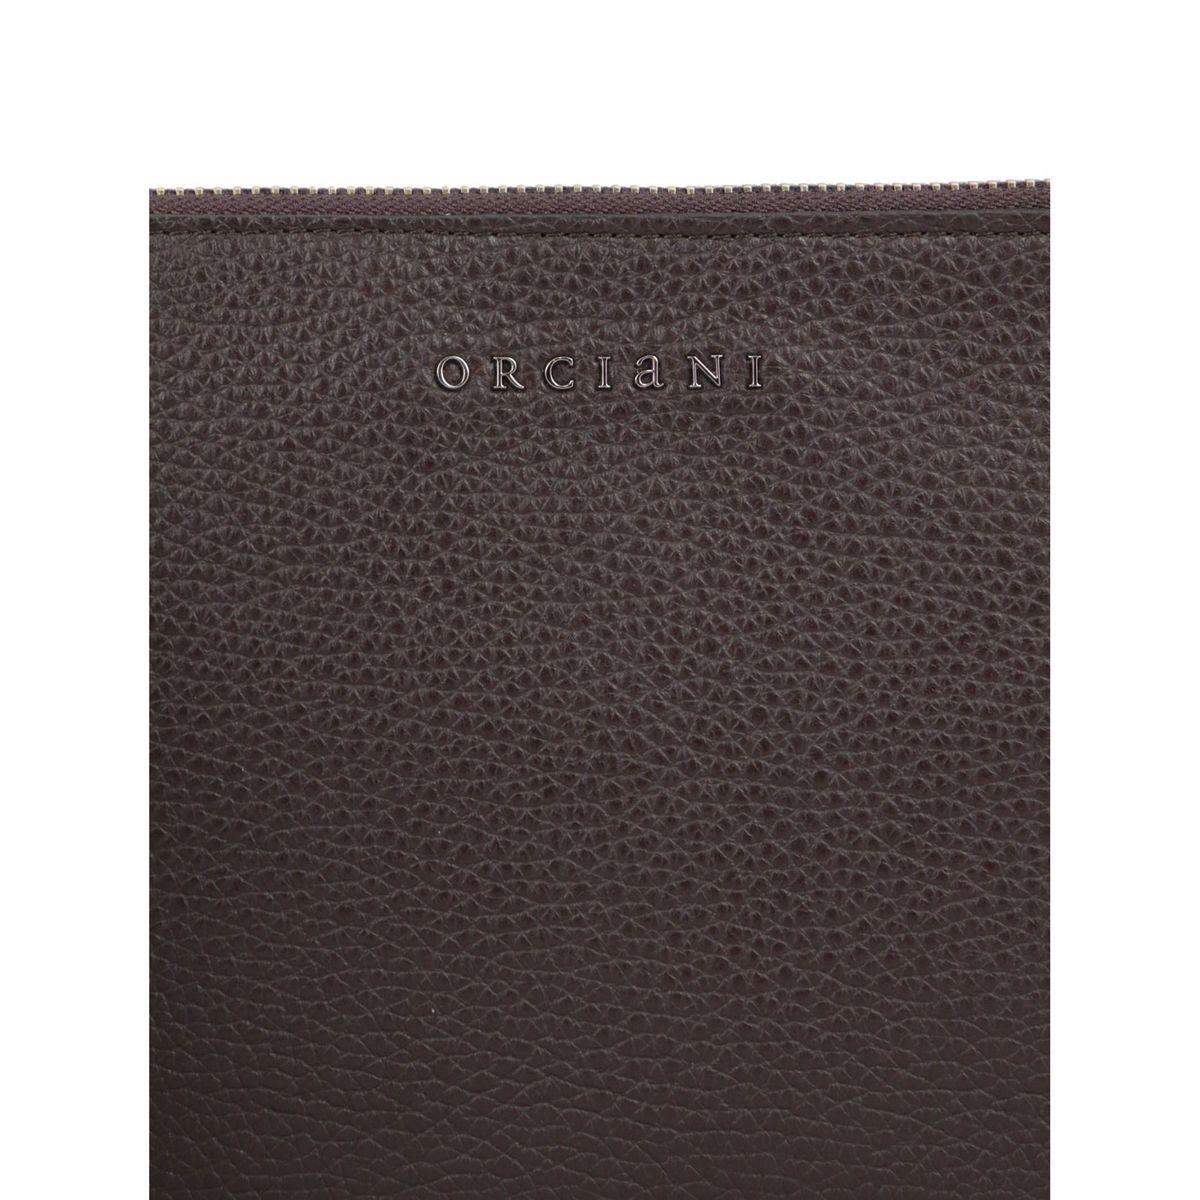 Micron leather clutch bag Ebony Orciani